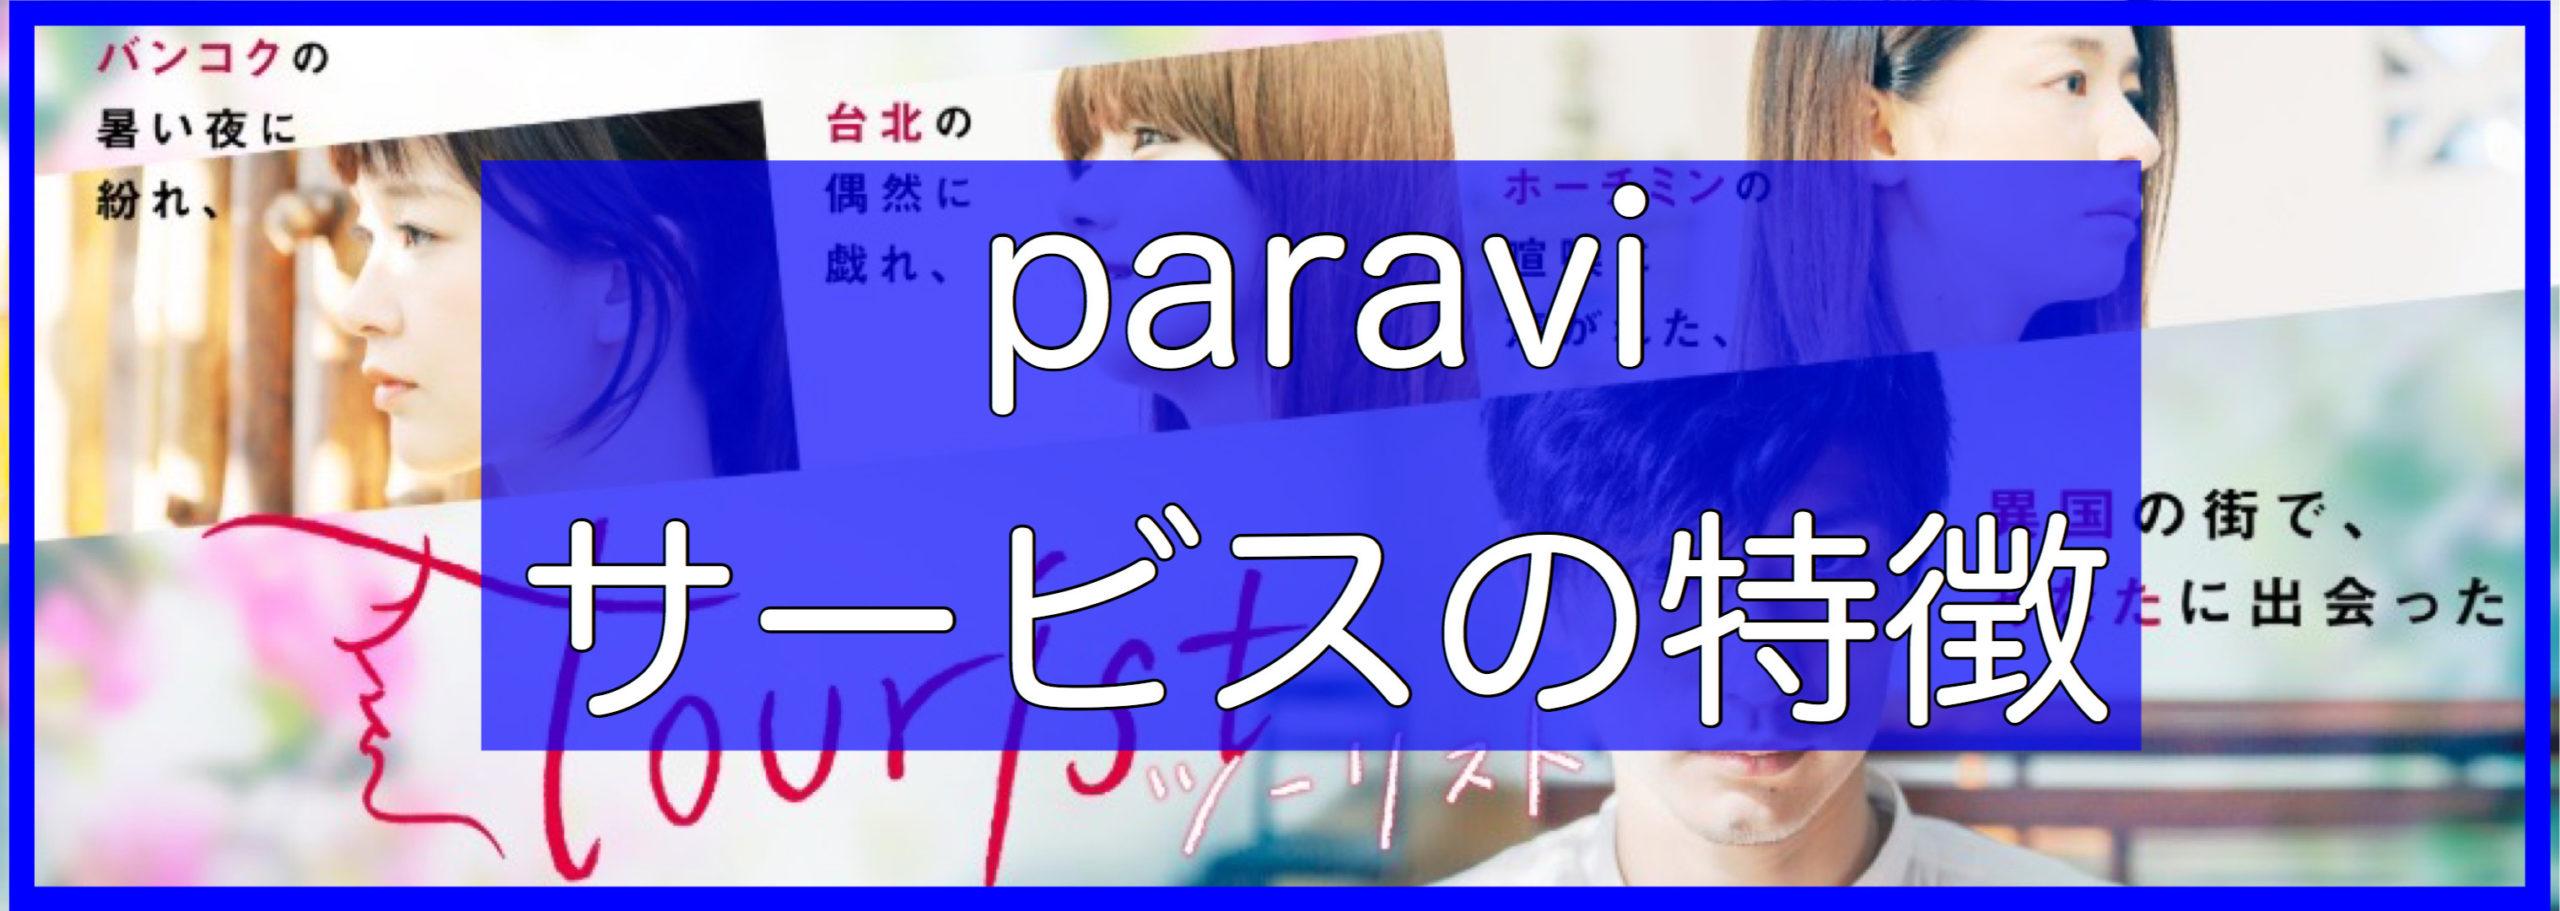 Paravi サービスの特徴